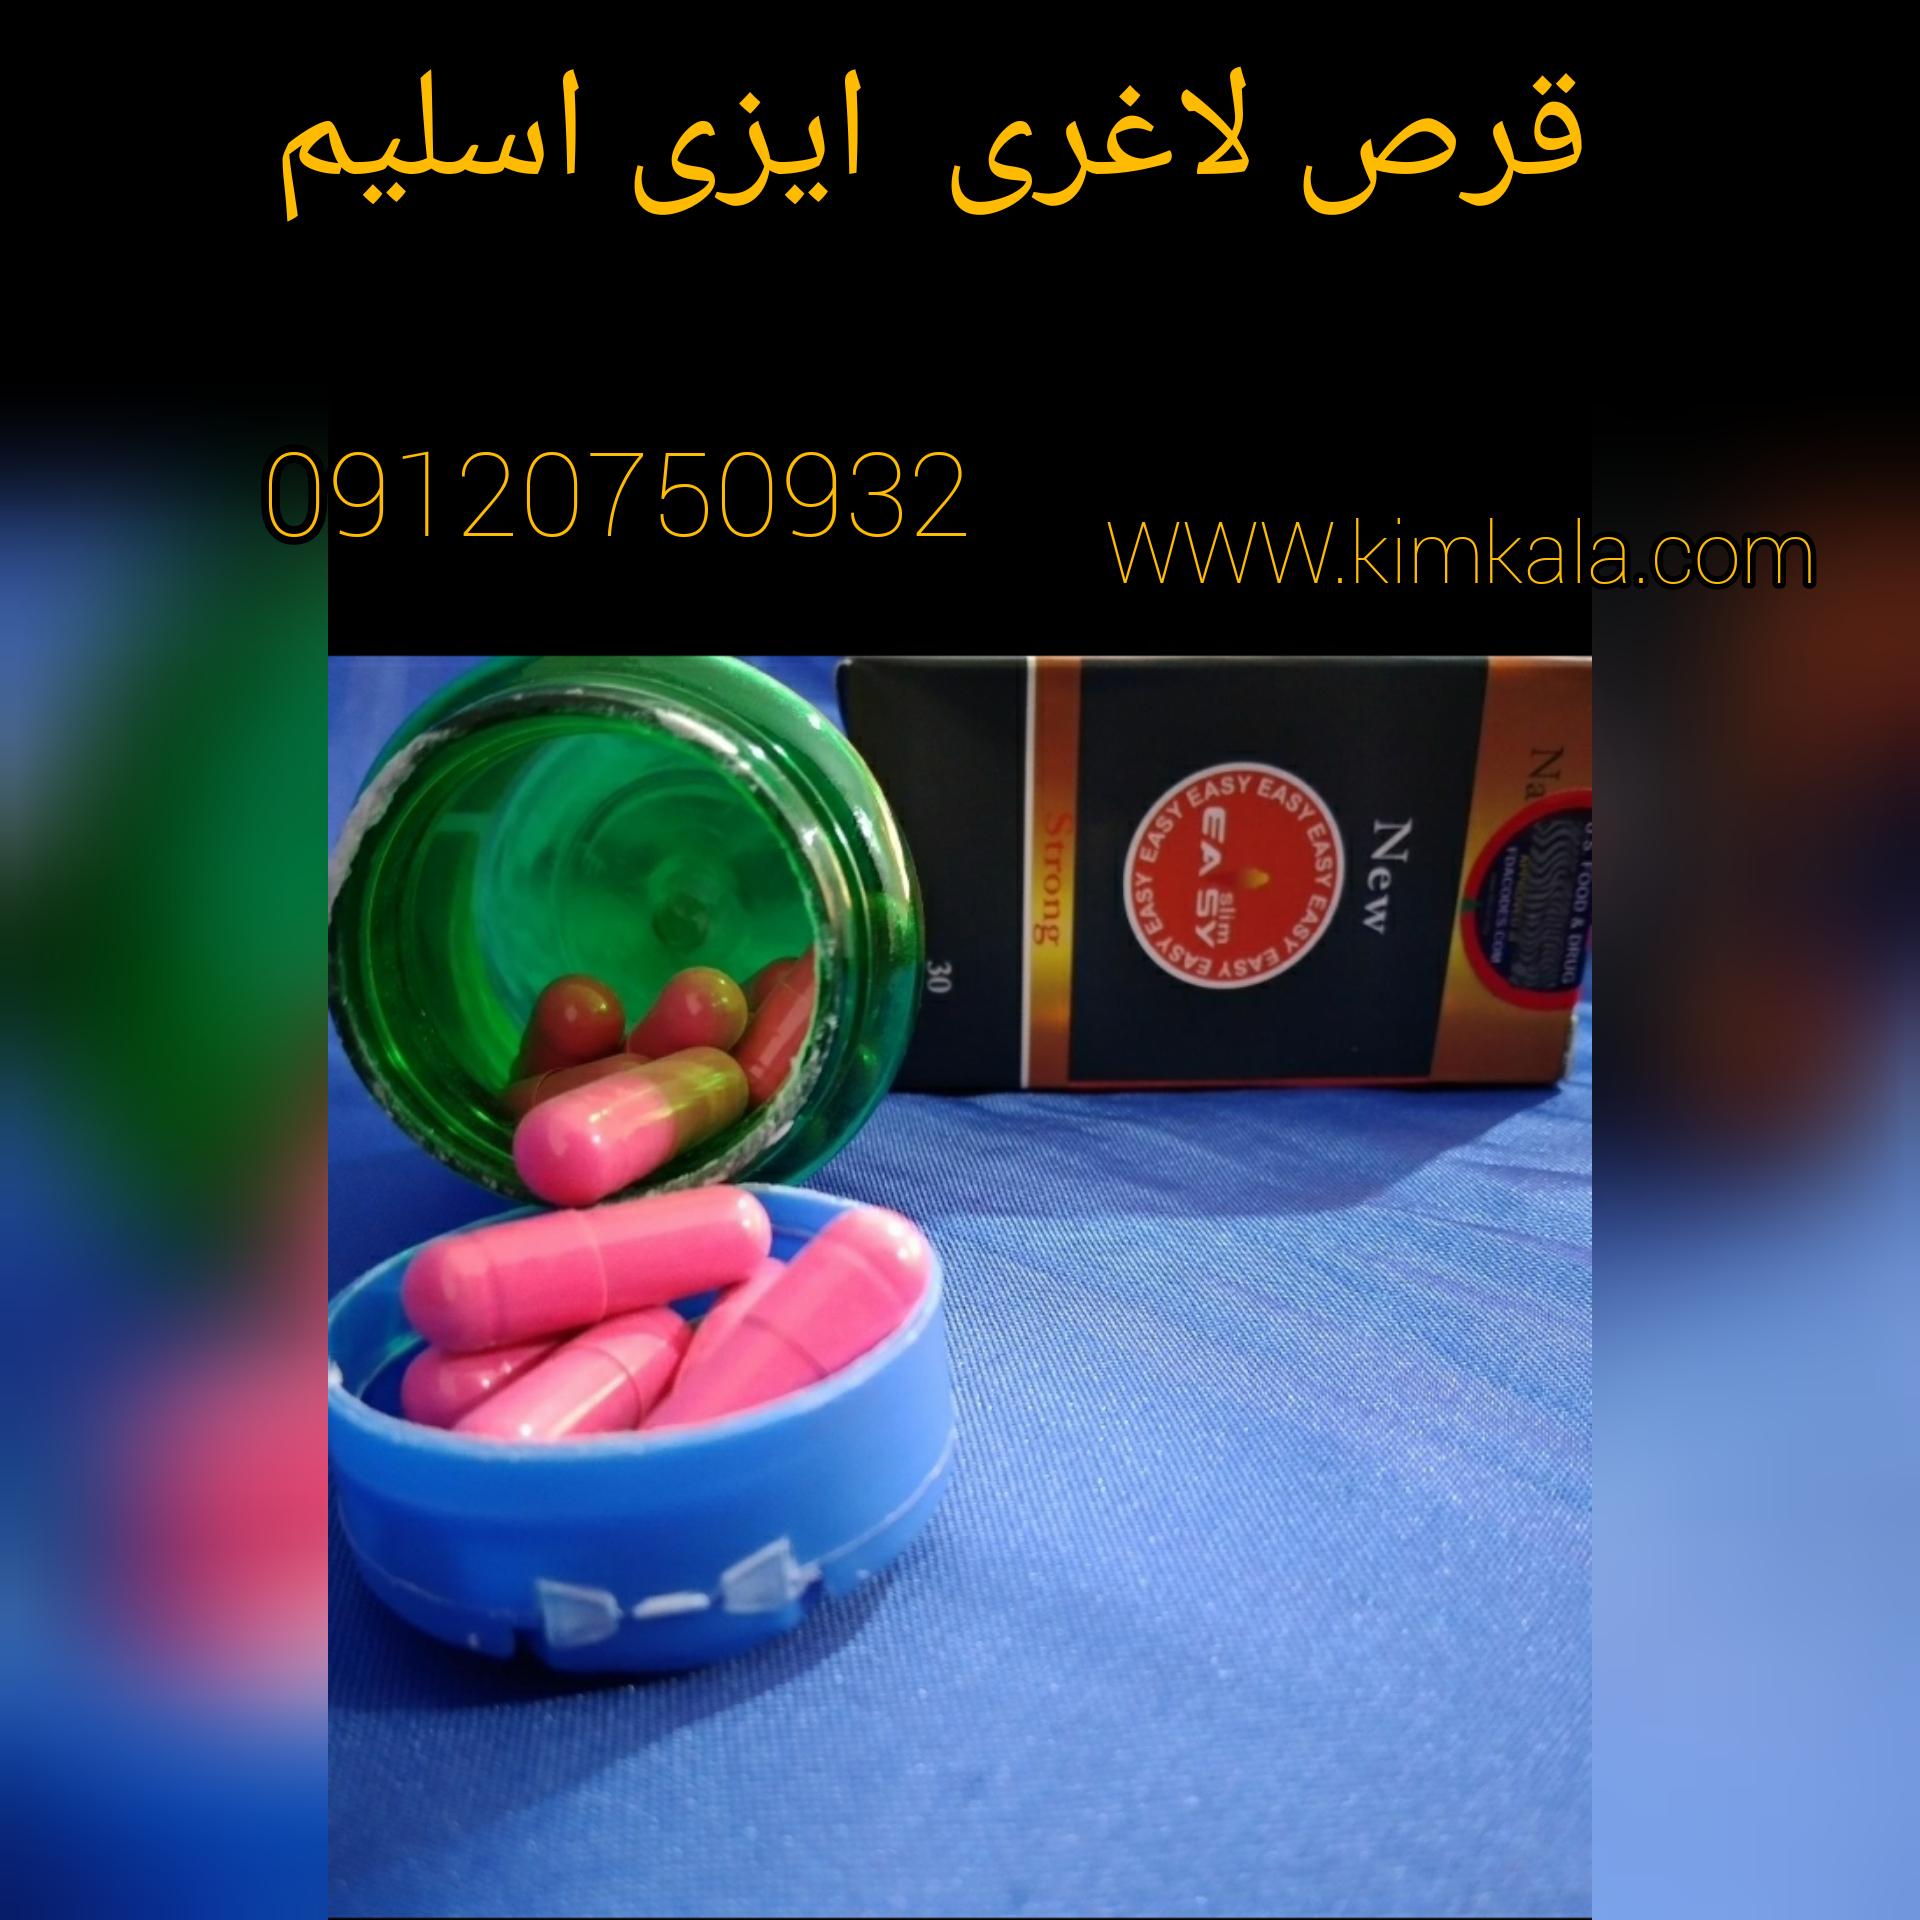 قرص لاغری ایزی اسلیم/09120750932/ترکیبات قرص لاغری